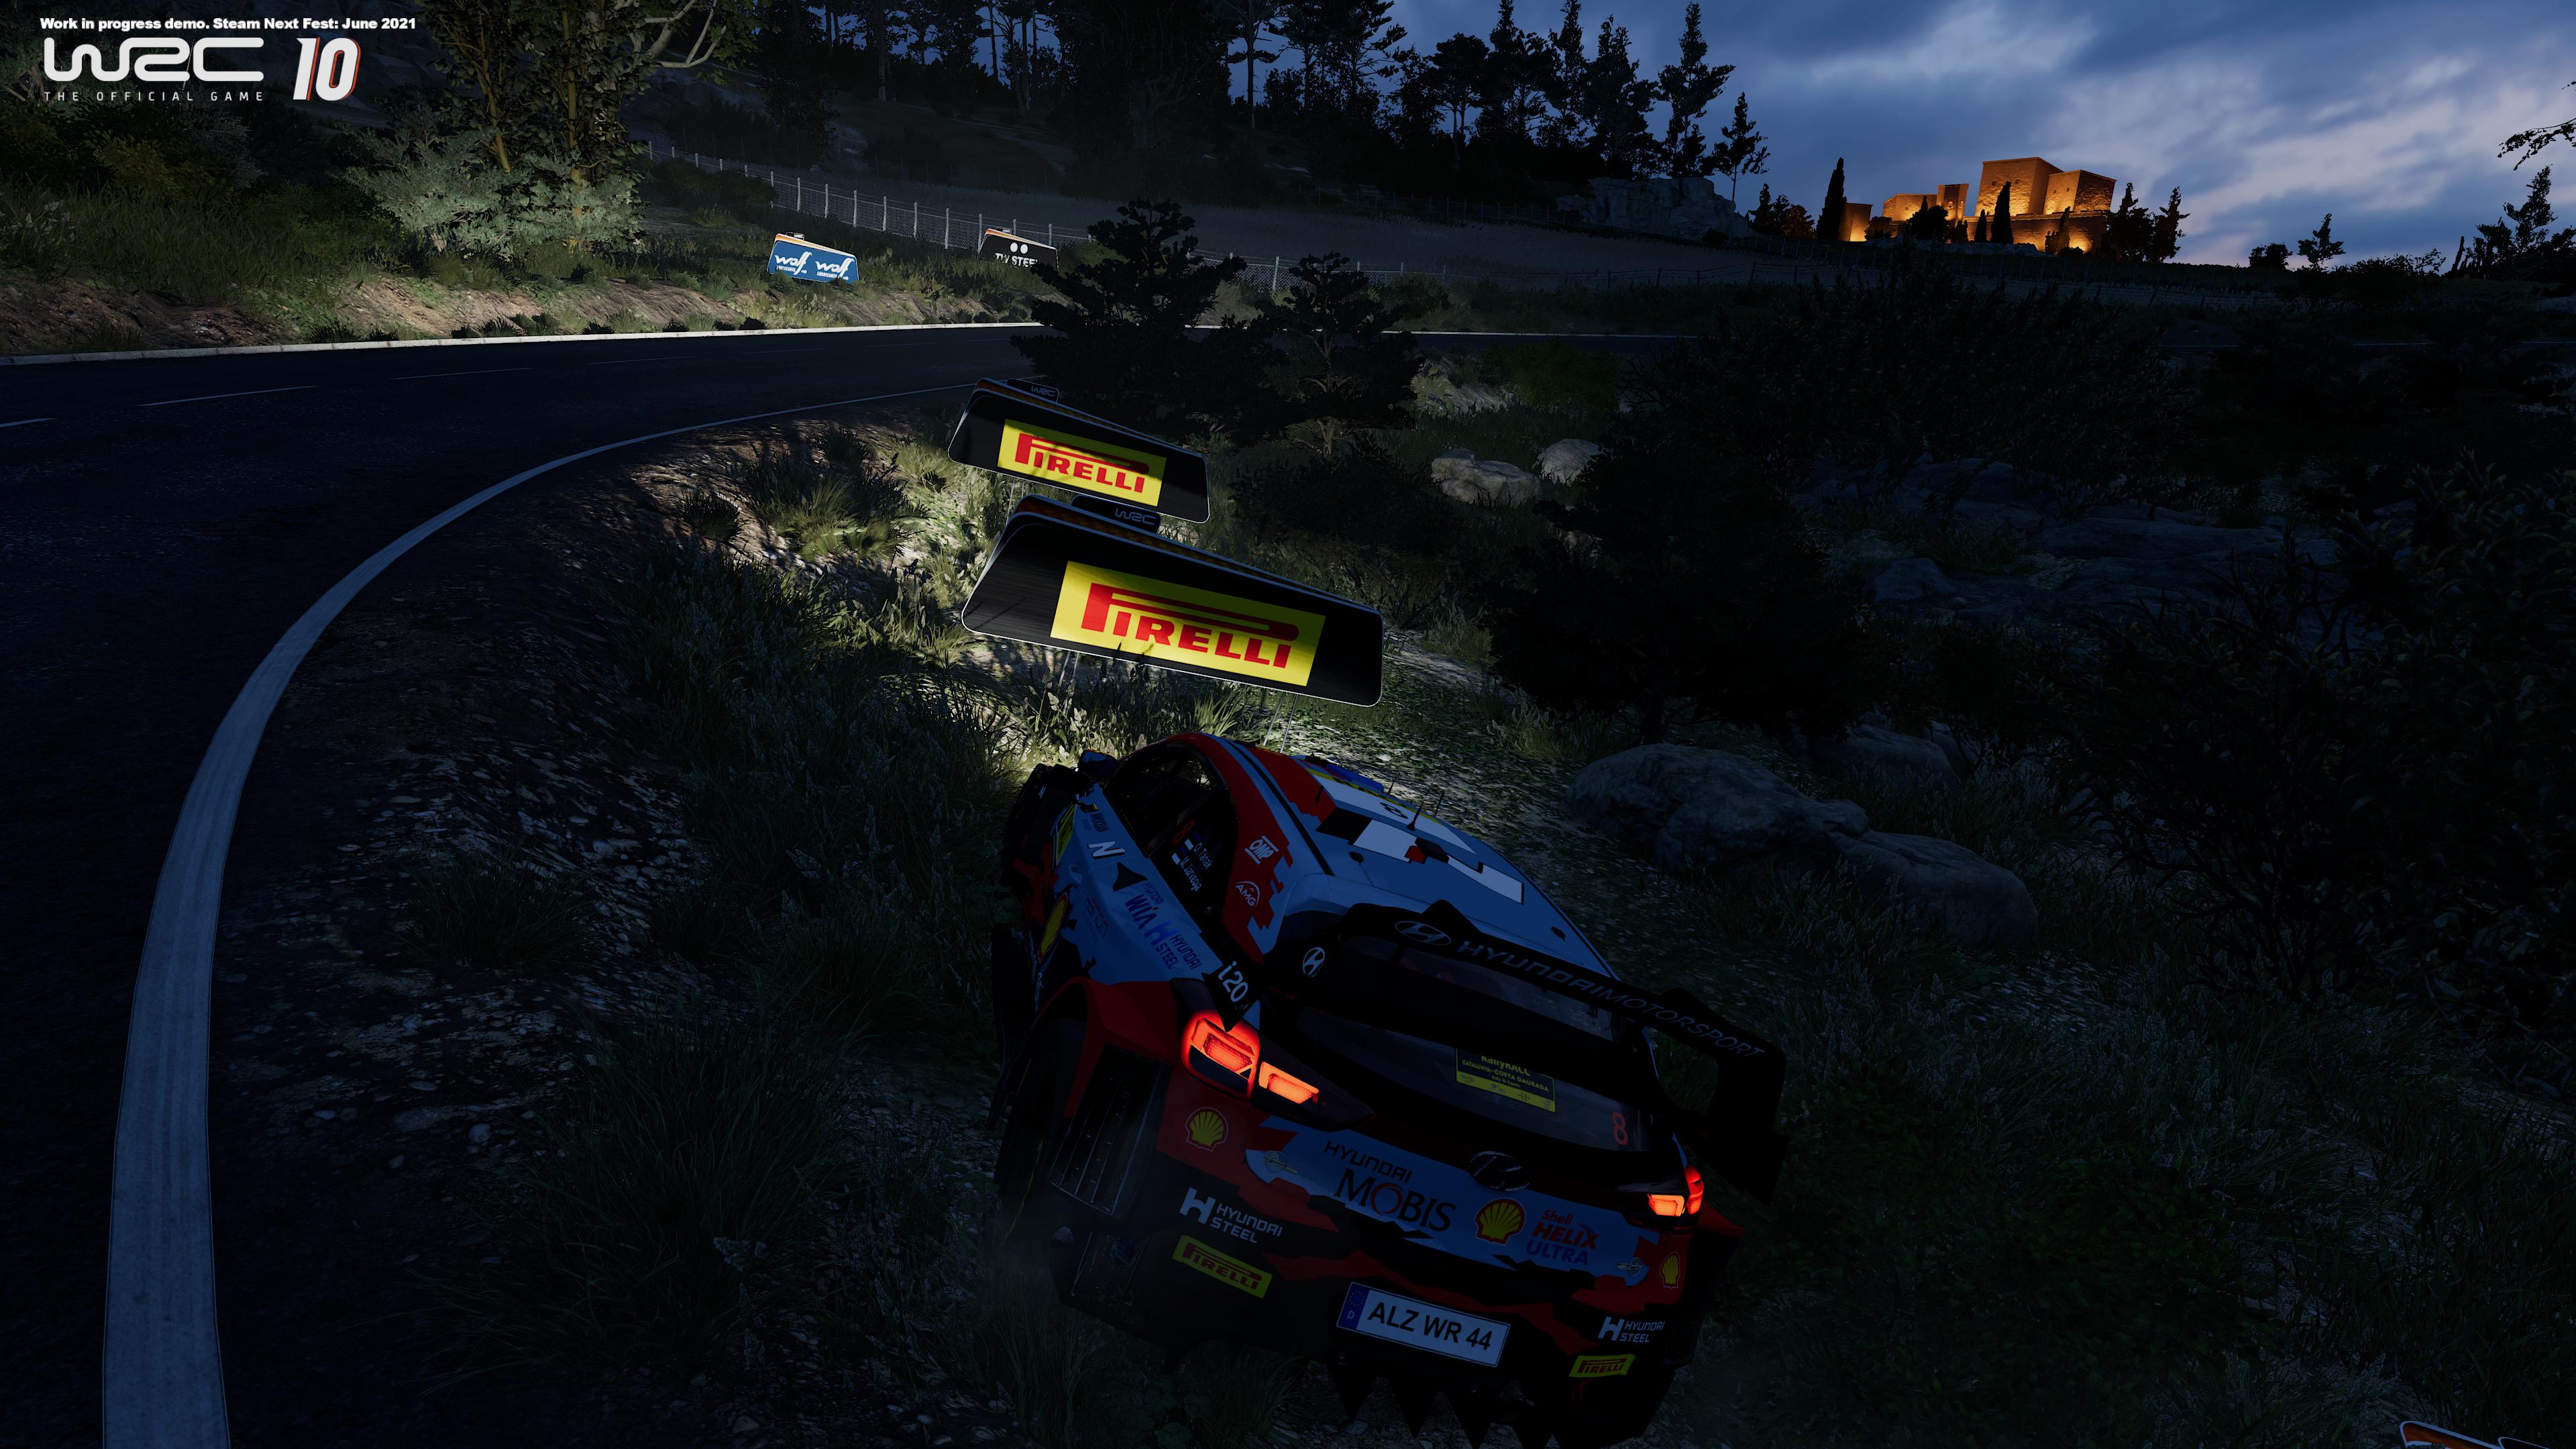 Wrc 10 Fia World Rally Championship Demo Screenshot 2021.06.12 - 13.50.00.73